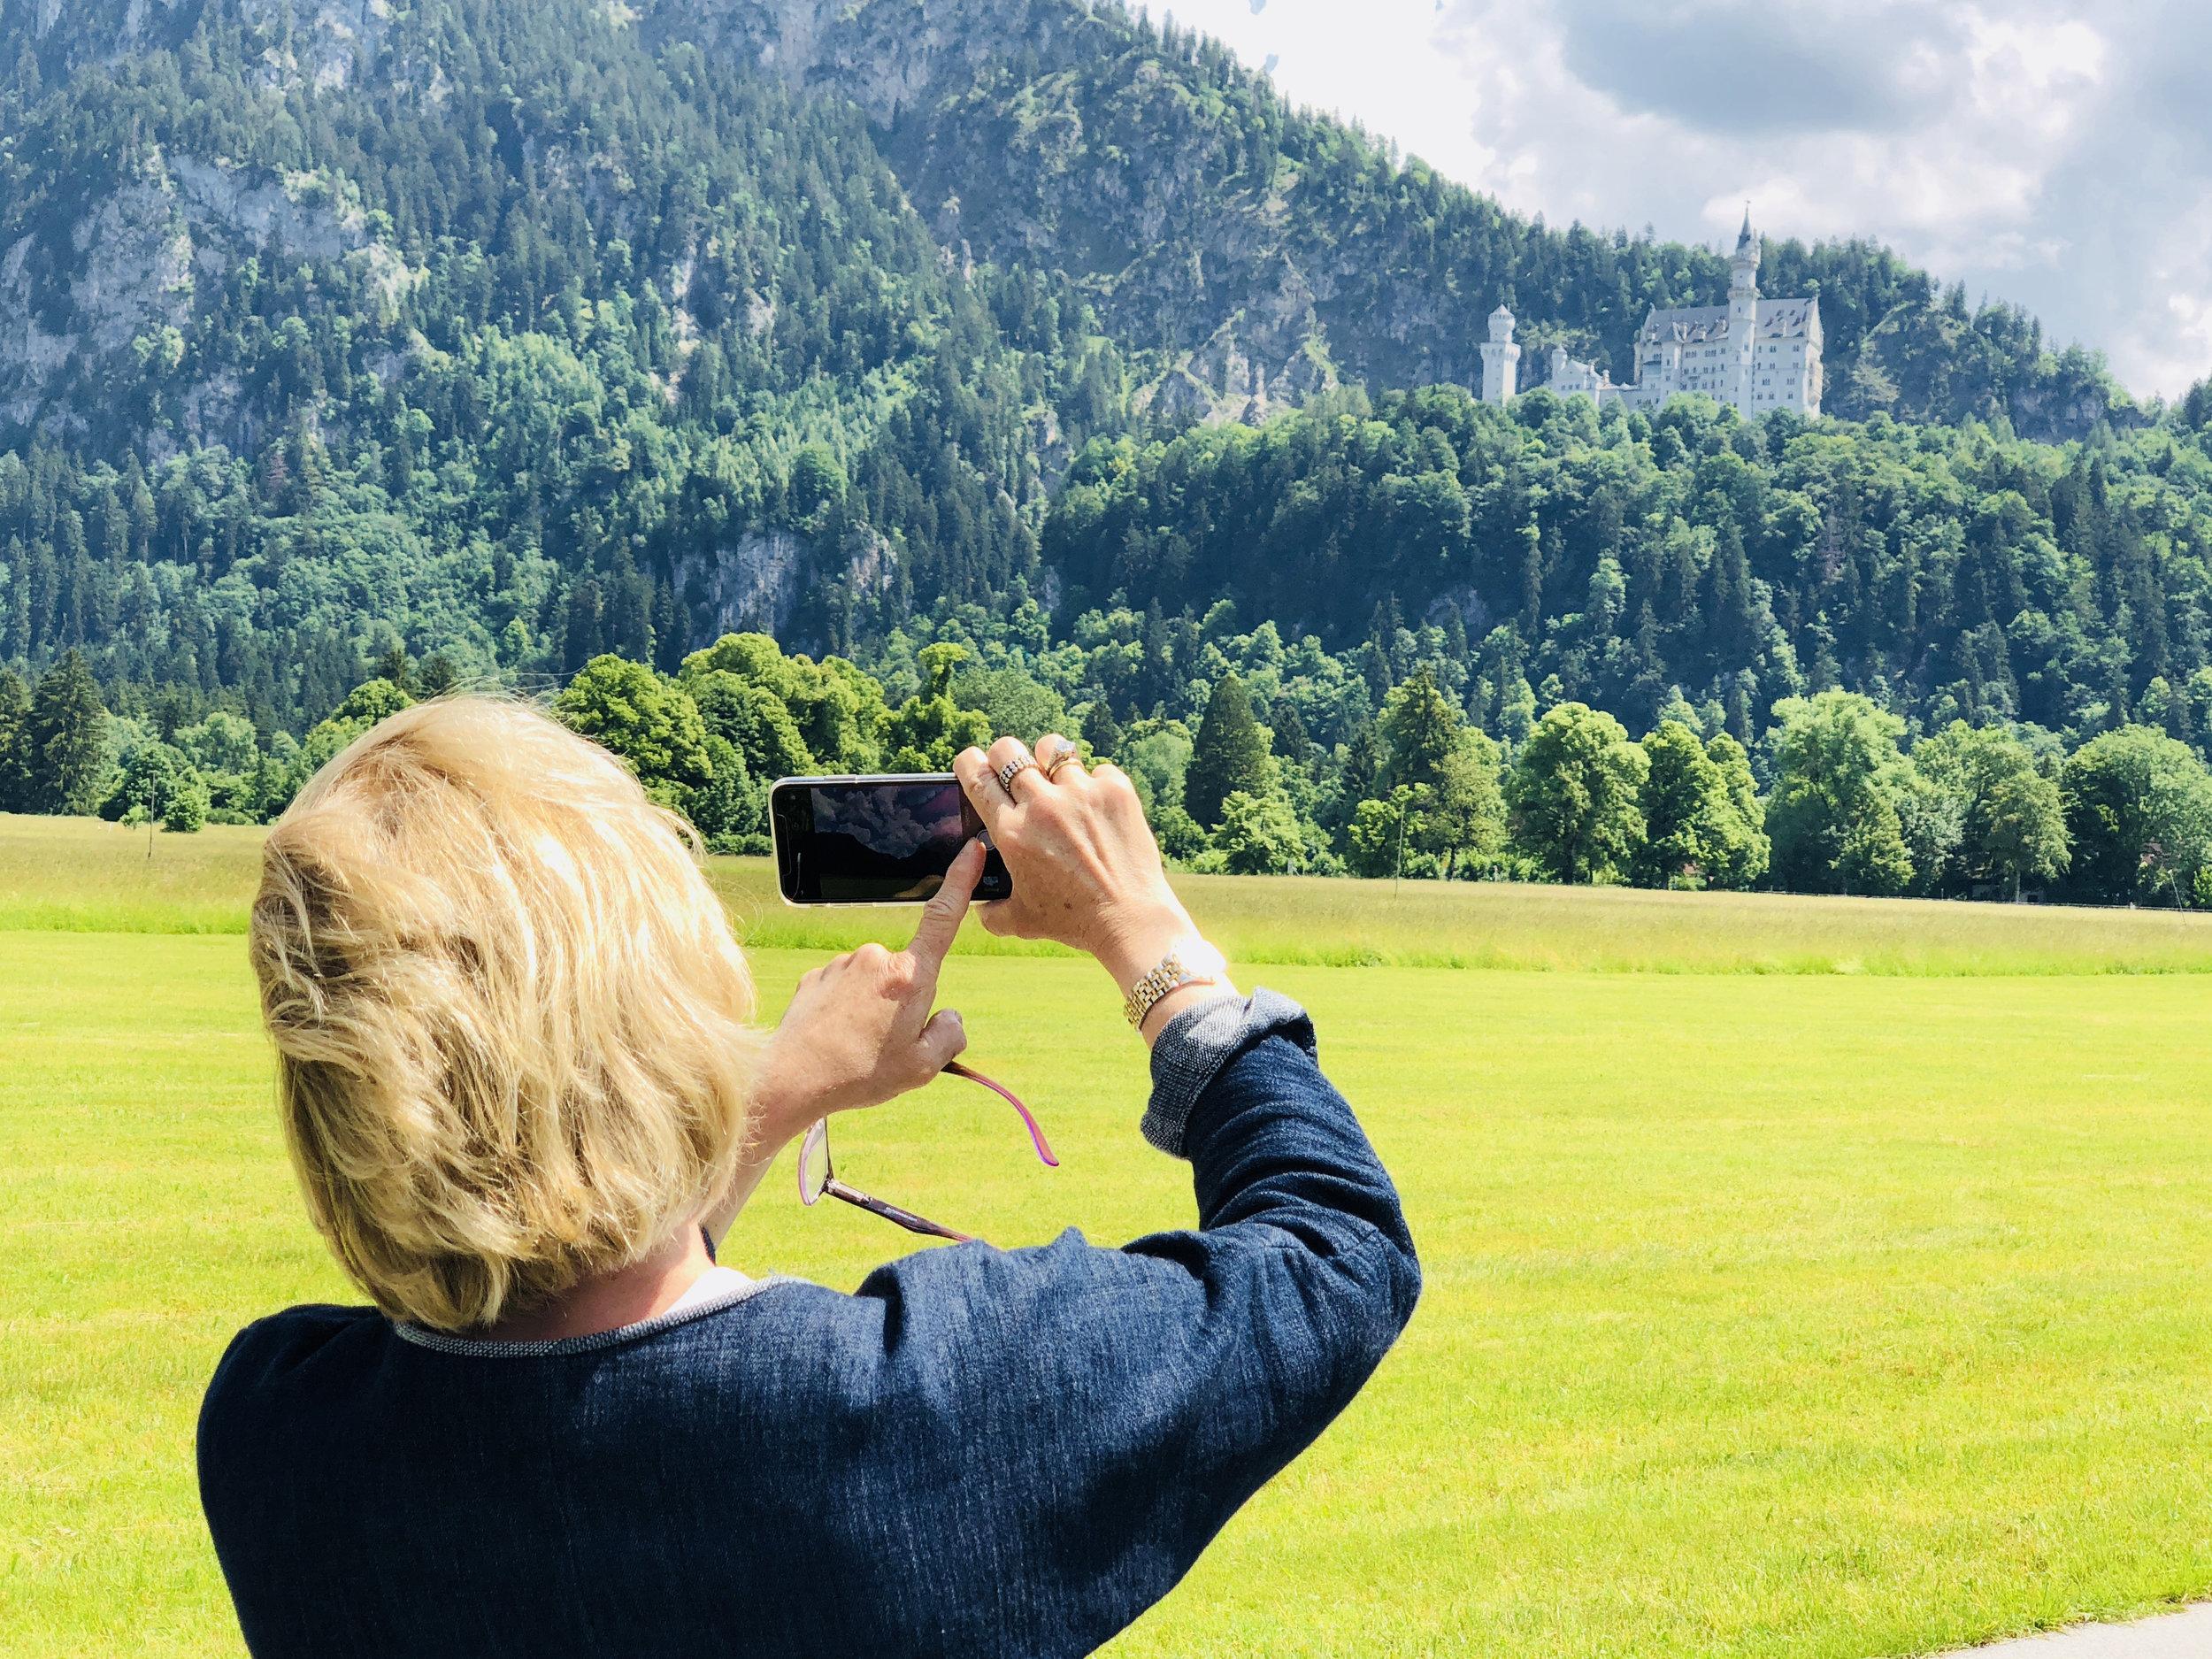 Teri_Day2_Castles_Germany&Austria_spiritedtable_photo50.jpg